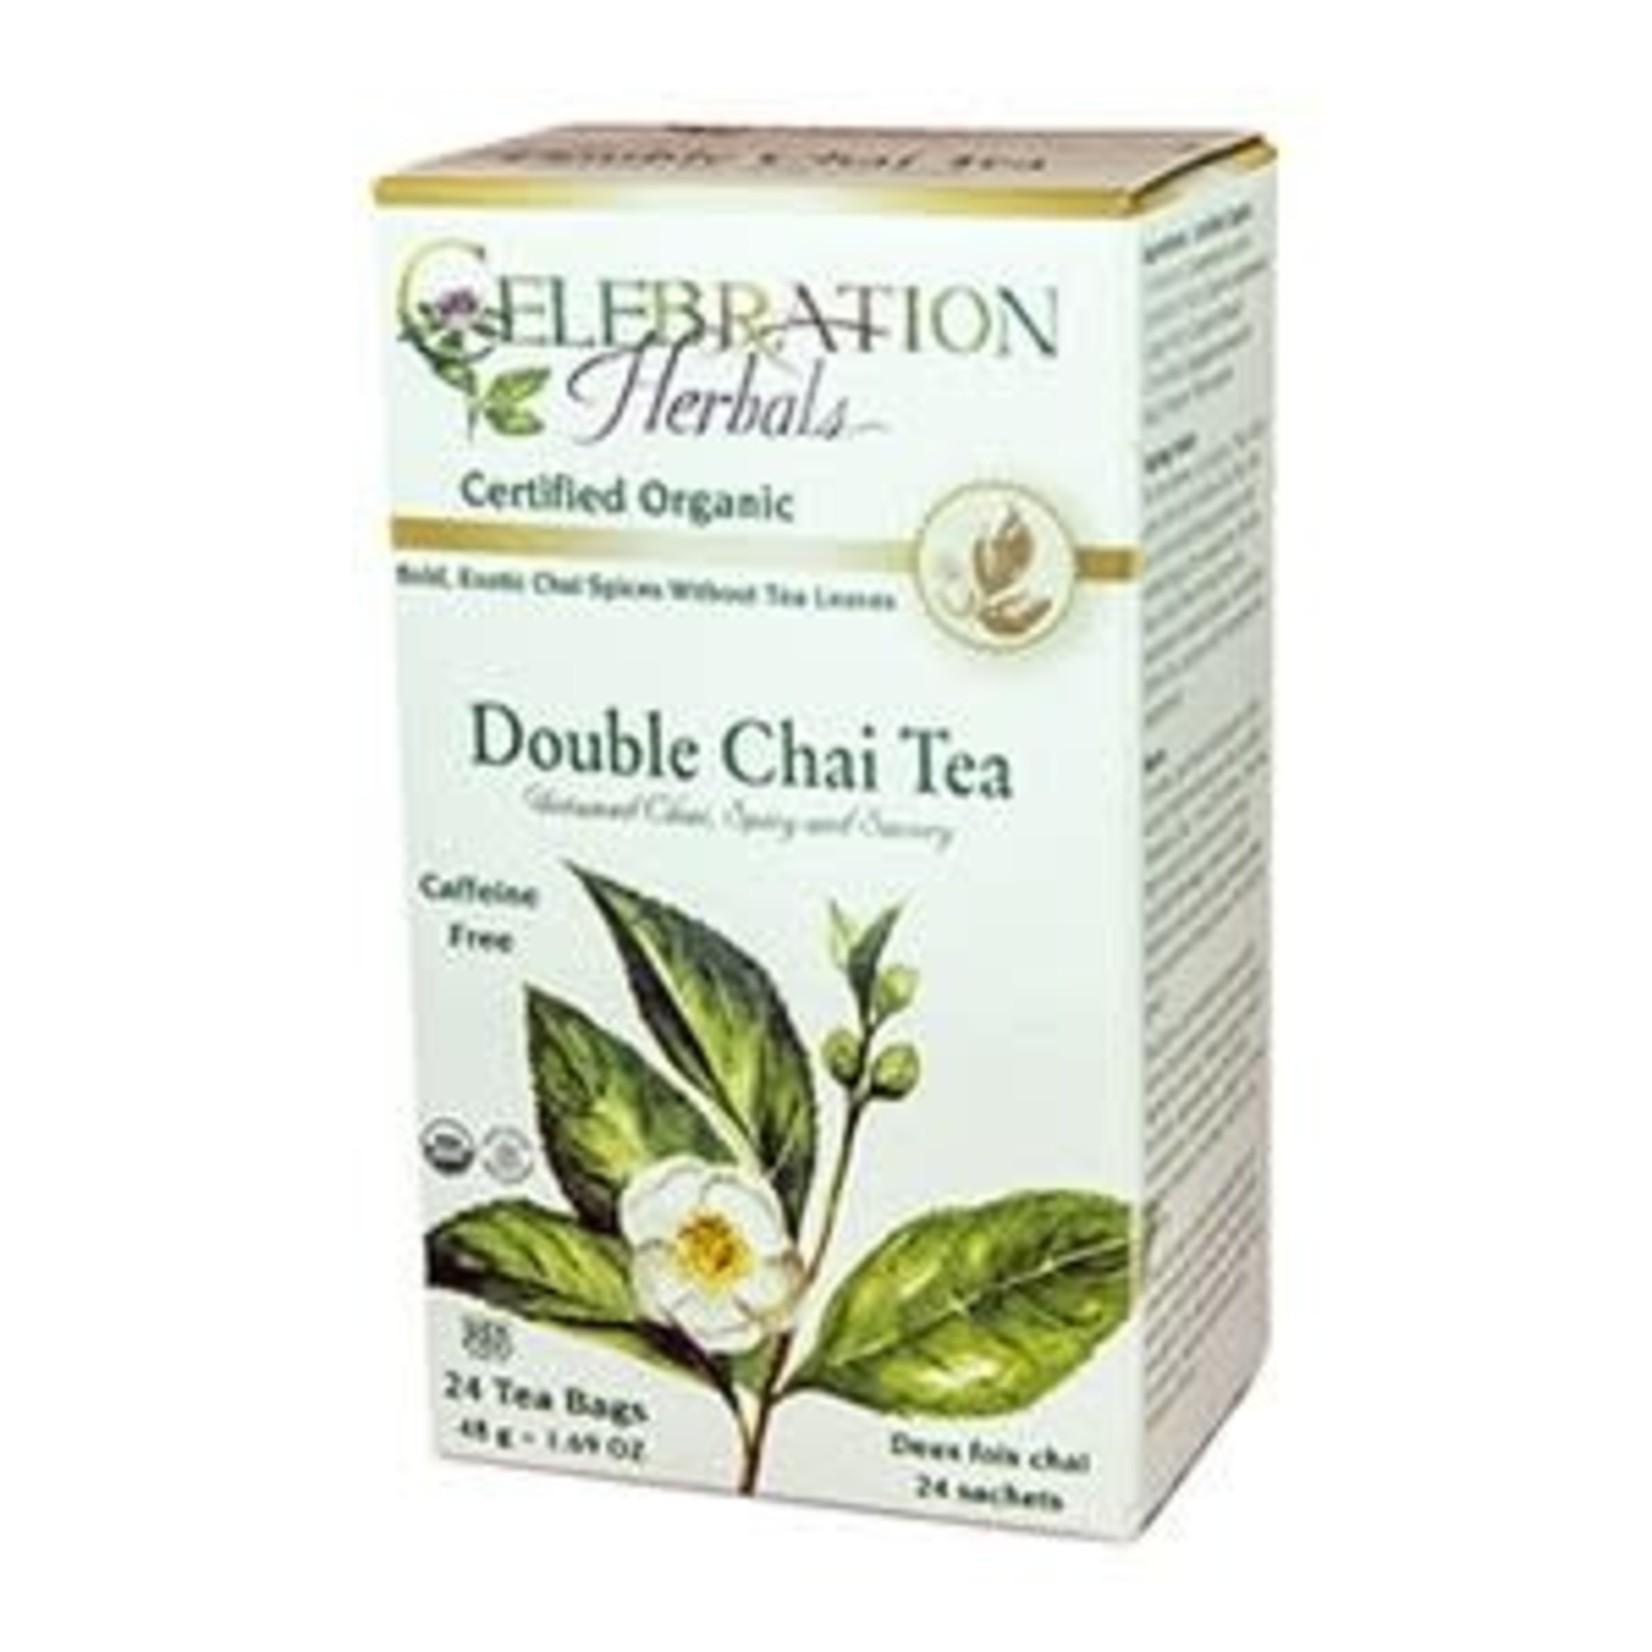 Celebration Herbals Celebration Herbals Double Chai Tea 24 Tea Bags